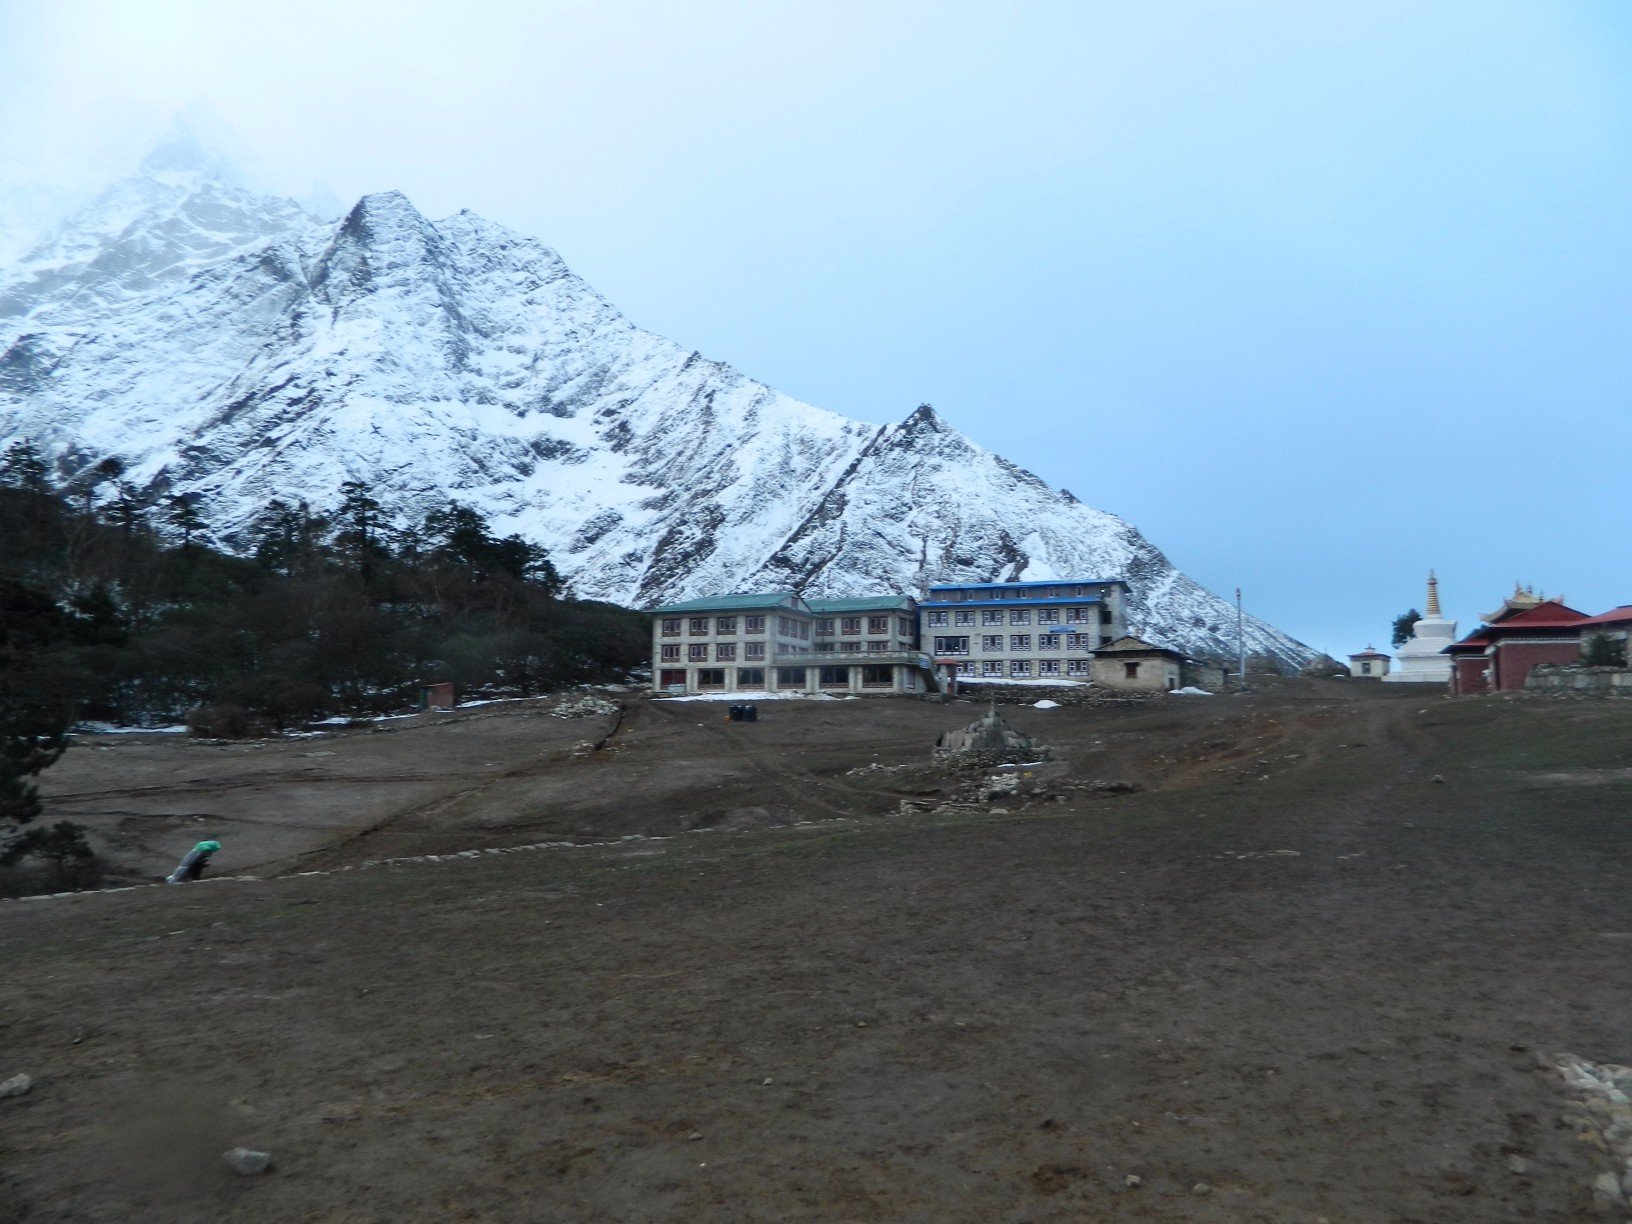 Tengboche, Nepal. The final stop on the Everest View Trek